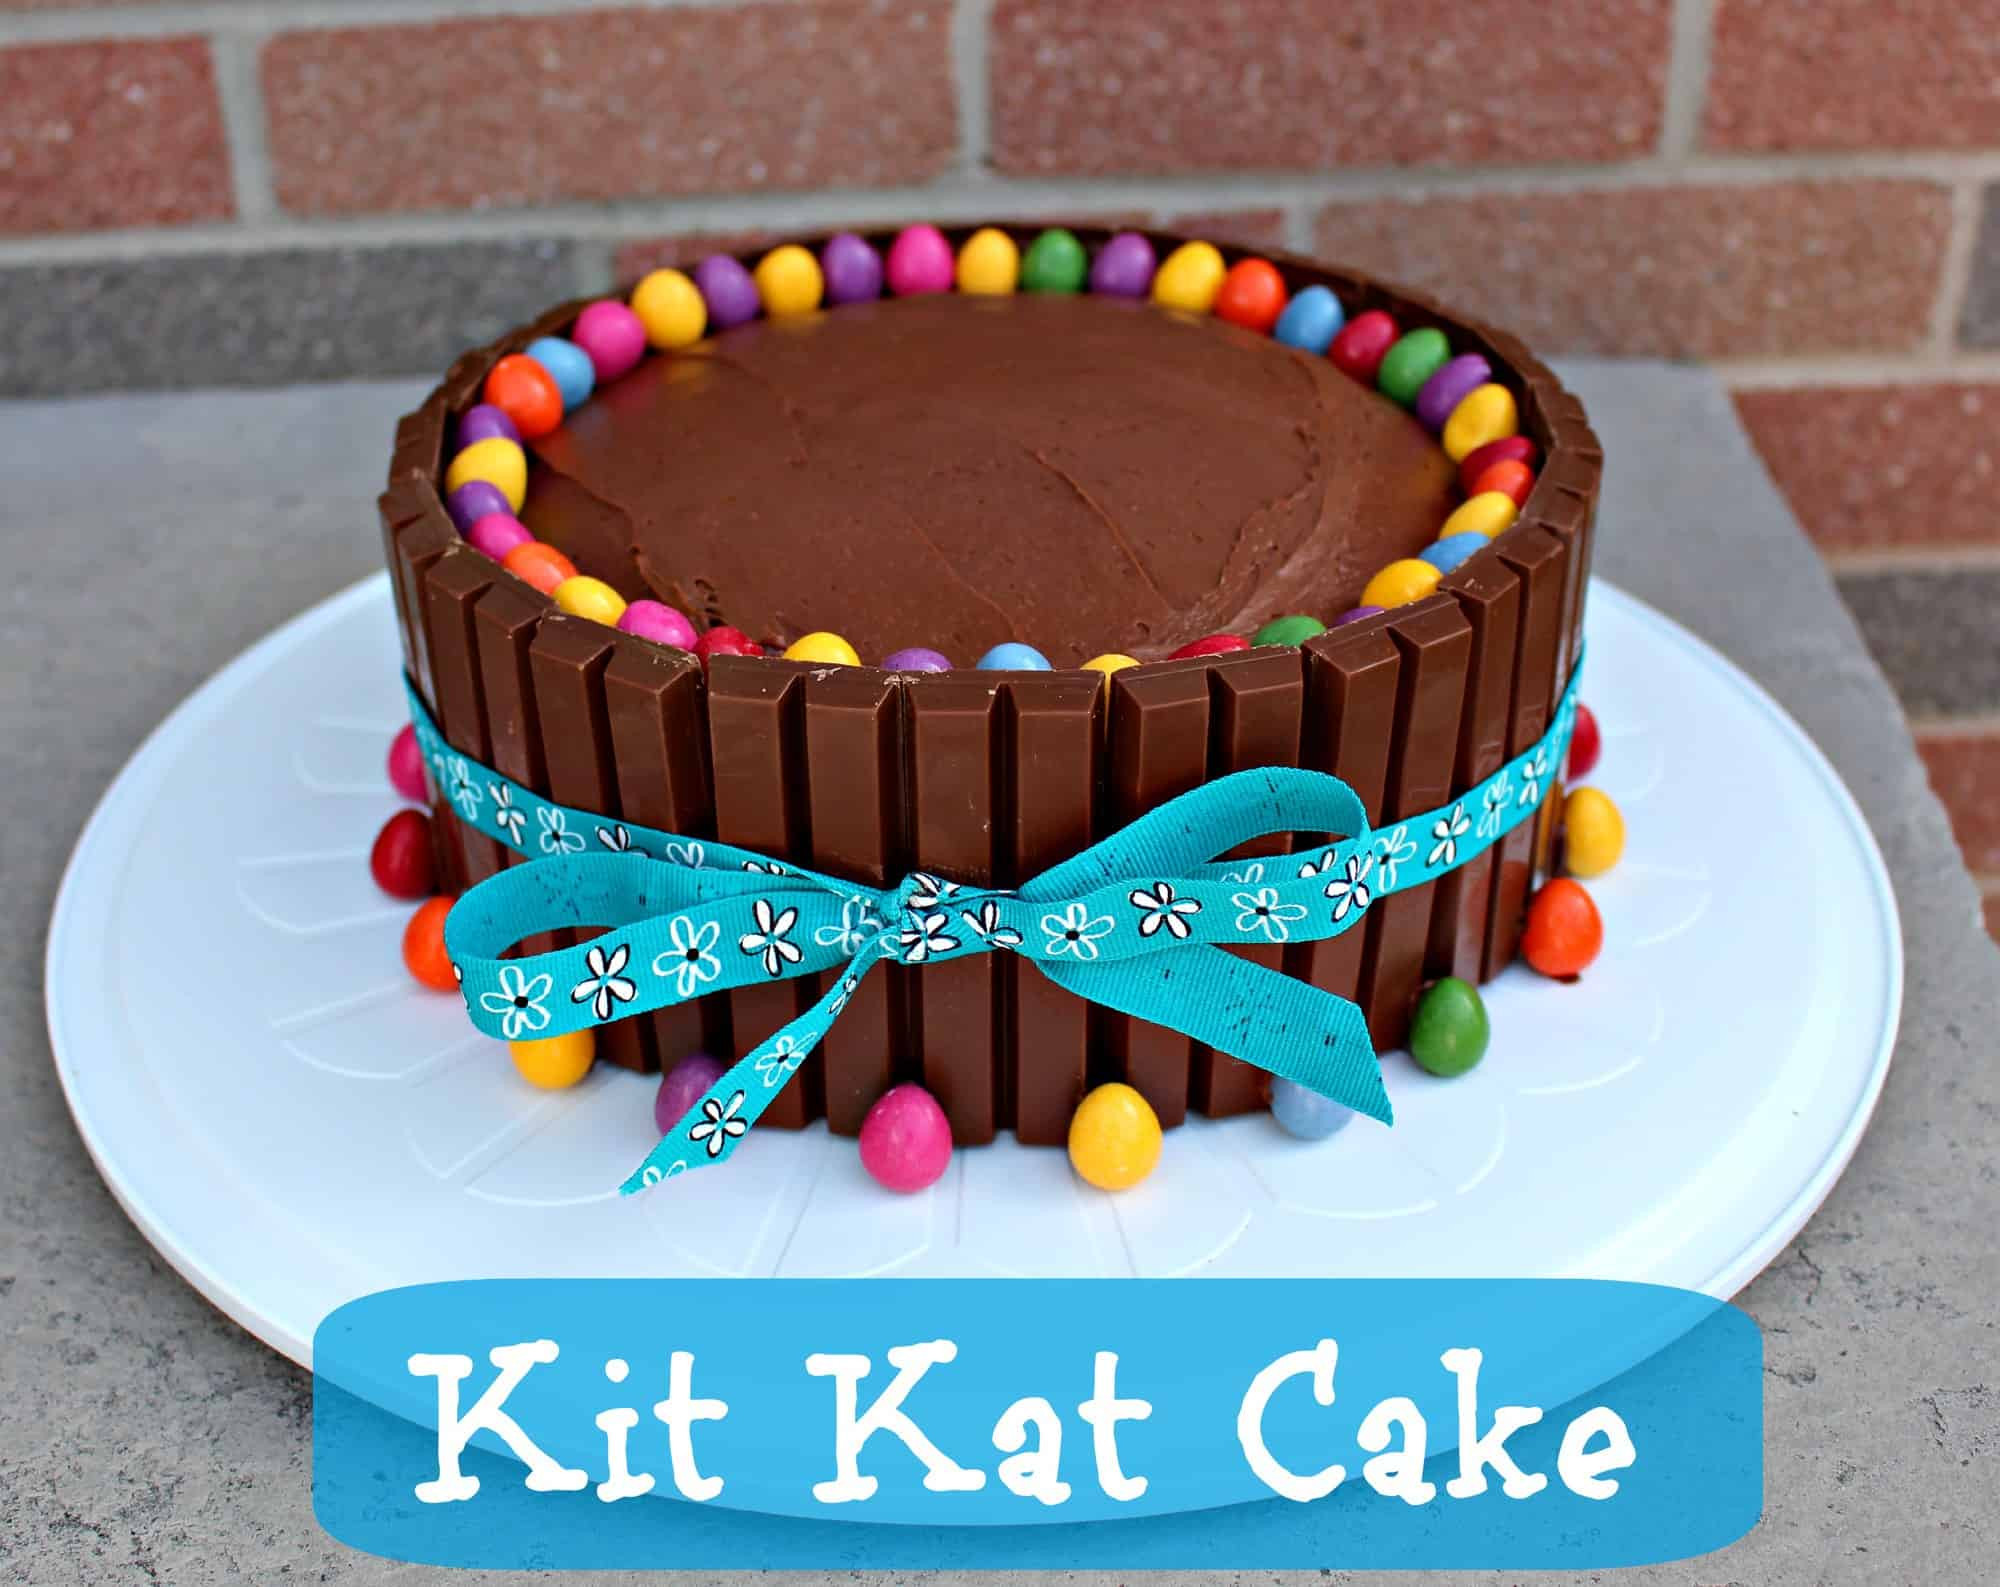 Homemade Birthday Cake Ideas  Easy Birthday Cake Ideas – Kit Kat Cake Recipe Little